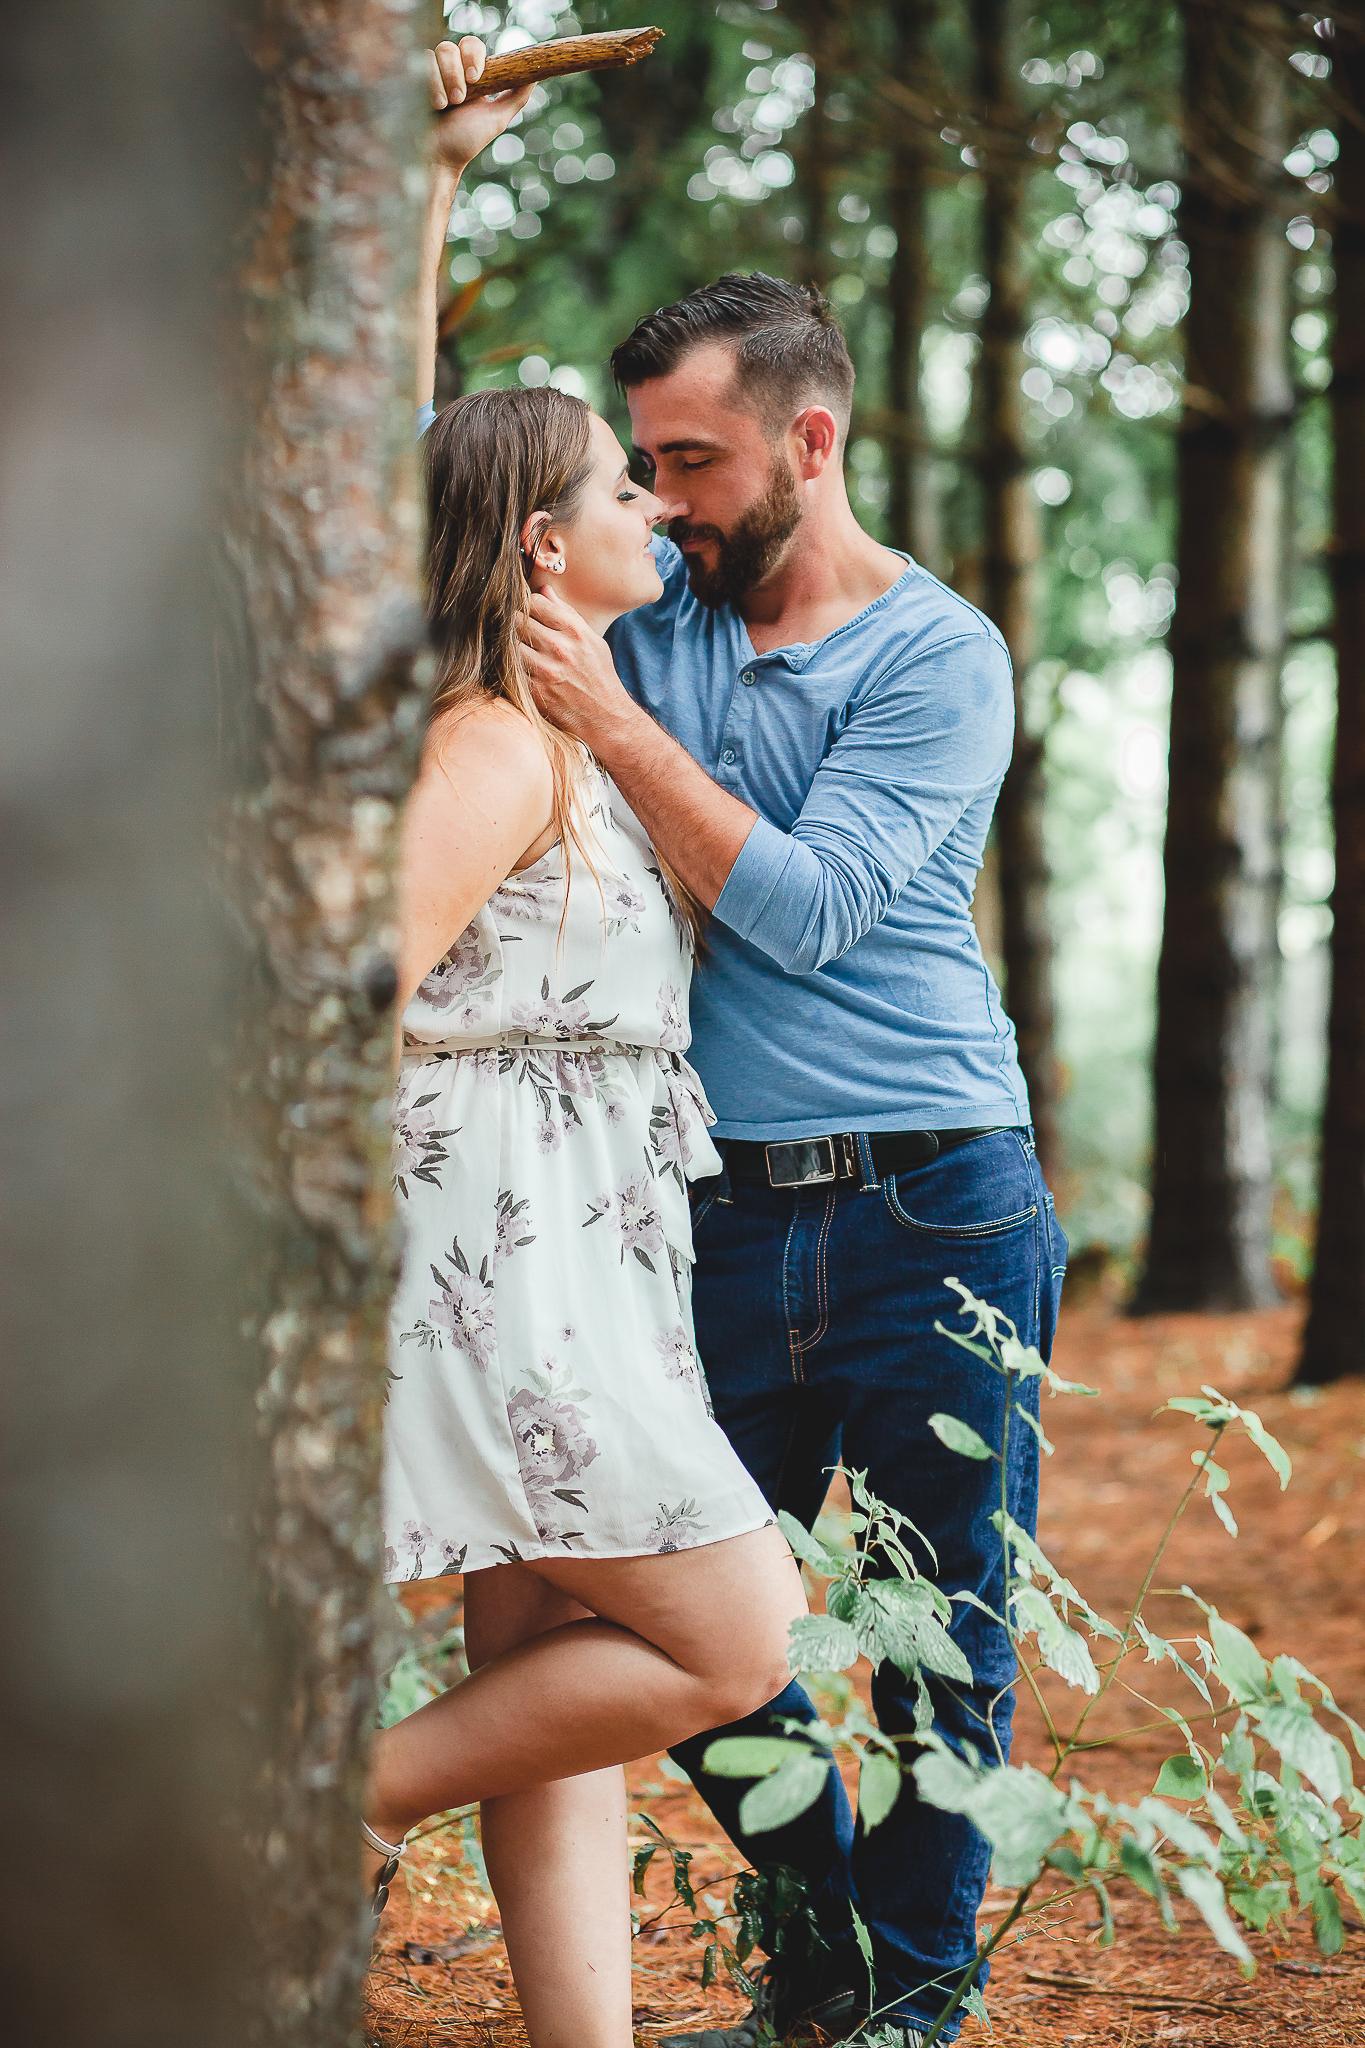 Amy D Photography- Barrie Wedding Photography- Barrie Wedding Photography- Engagement Session- Engagement Photography- Engagement Session Ideas- Wedding Photography-30.jpg